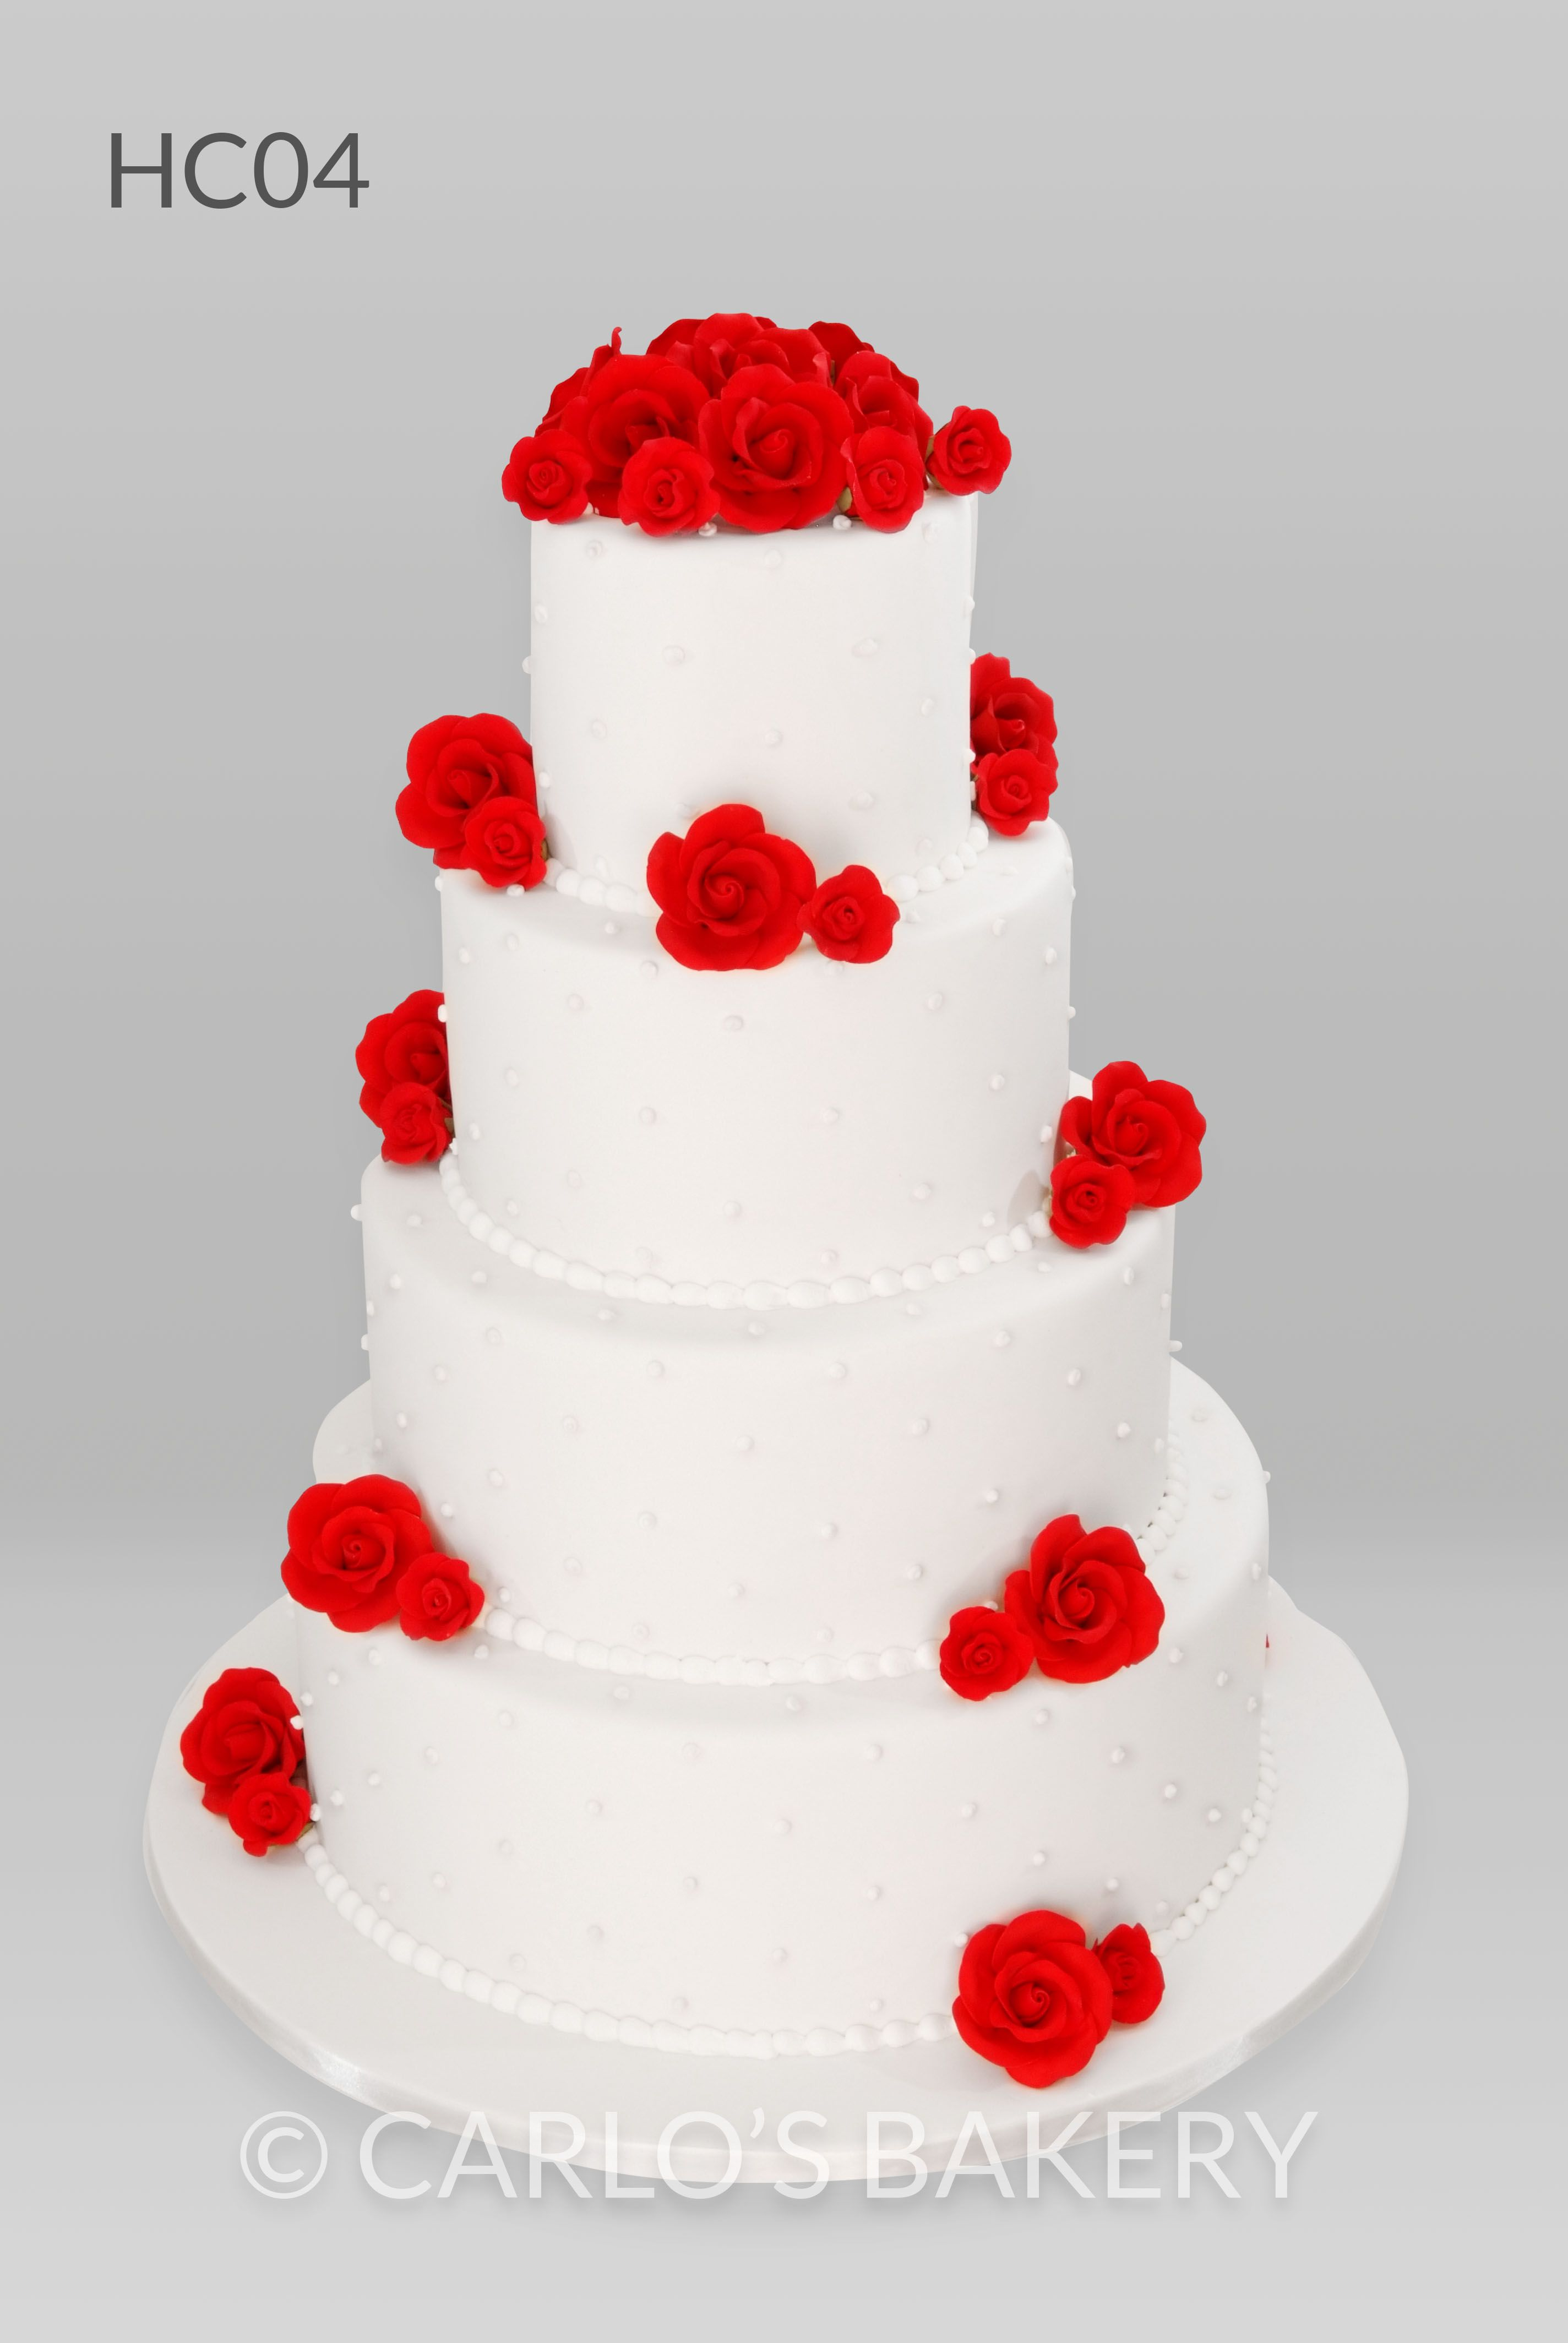 Carlos bakery hall wedding cake designs cake edible cake